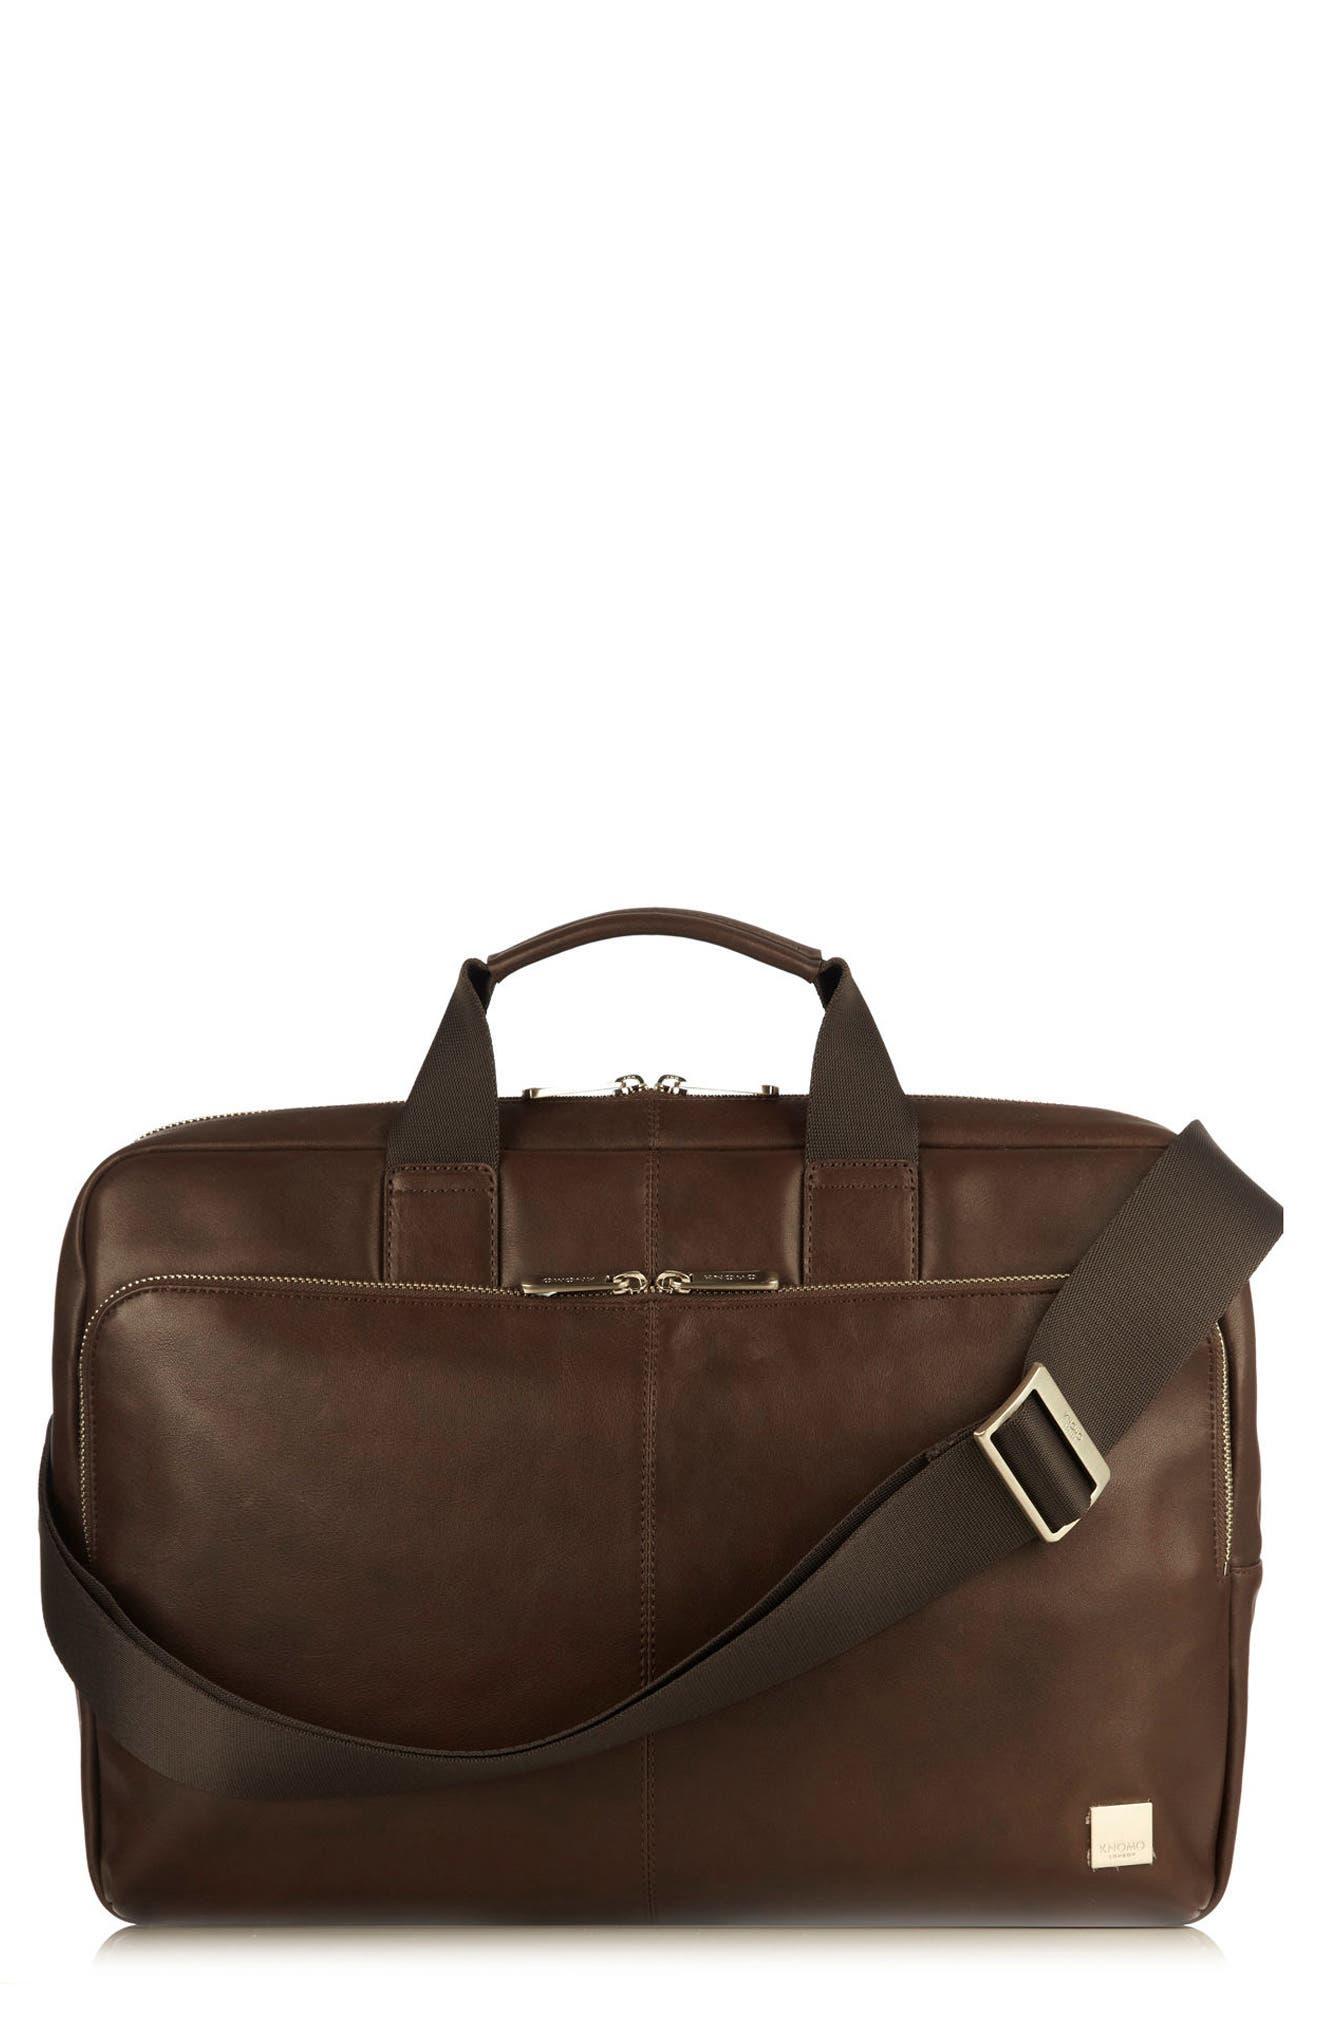 KNOMO London Brompton Newberry Leather Briefcase